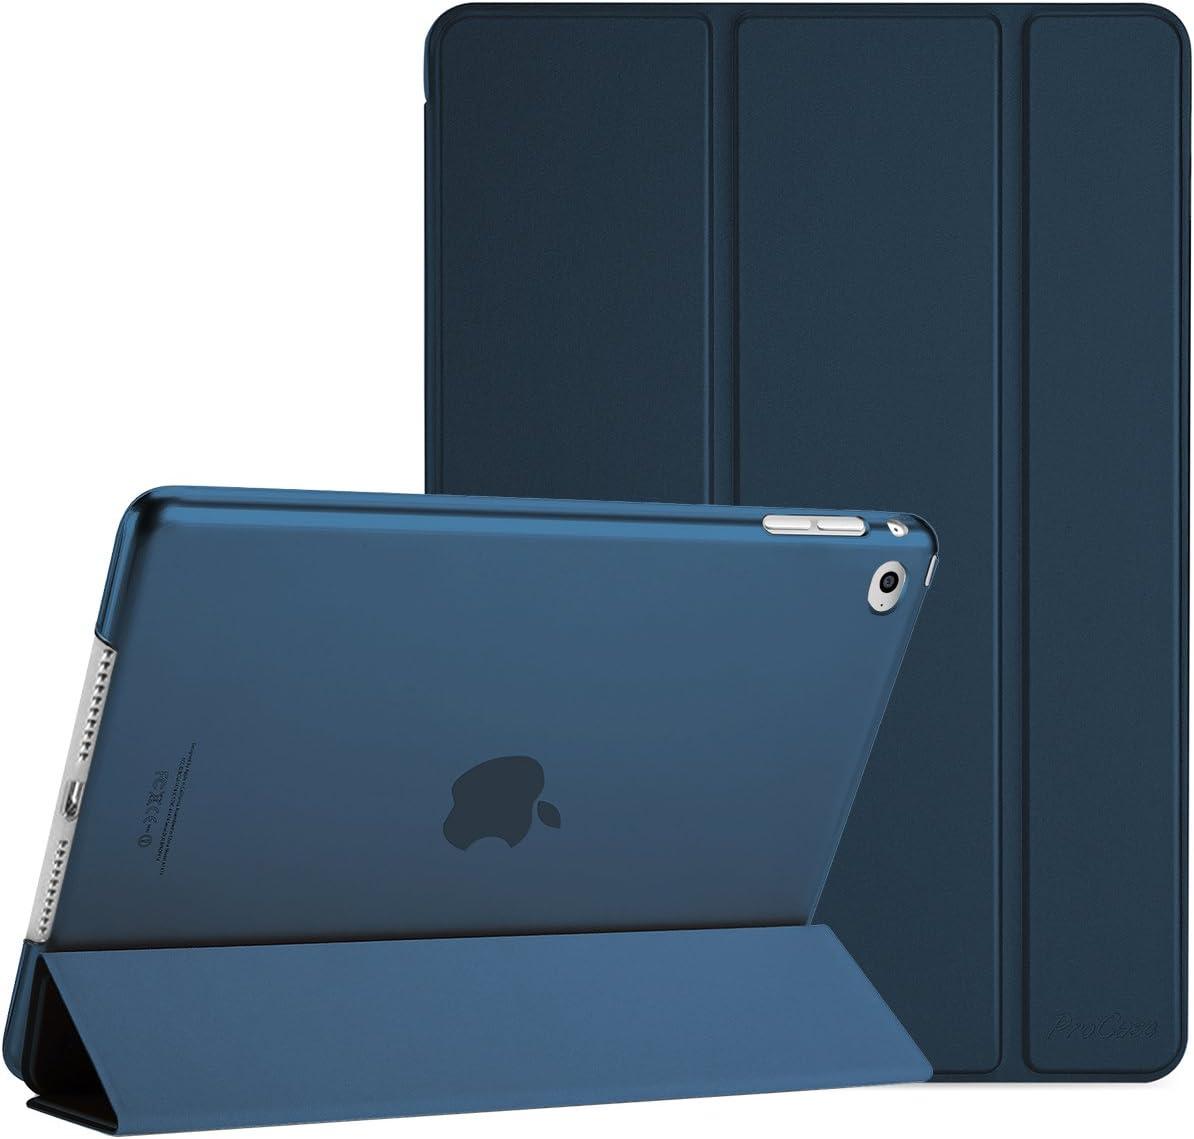 Funda Procase Smart Para iPad Air 2(a1566 A1567) Rjyy